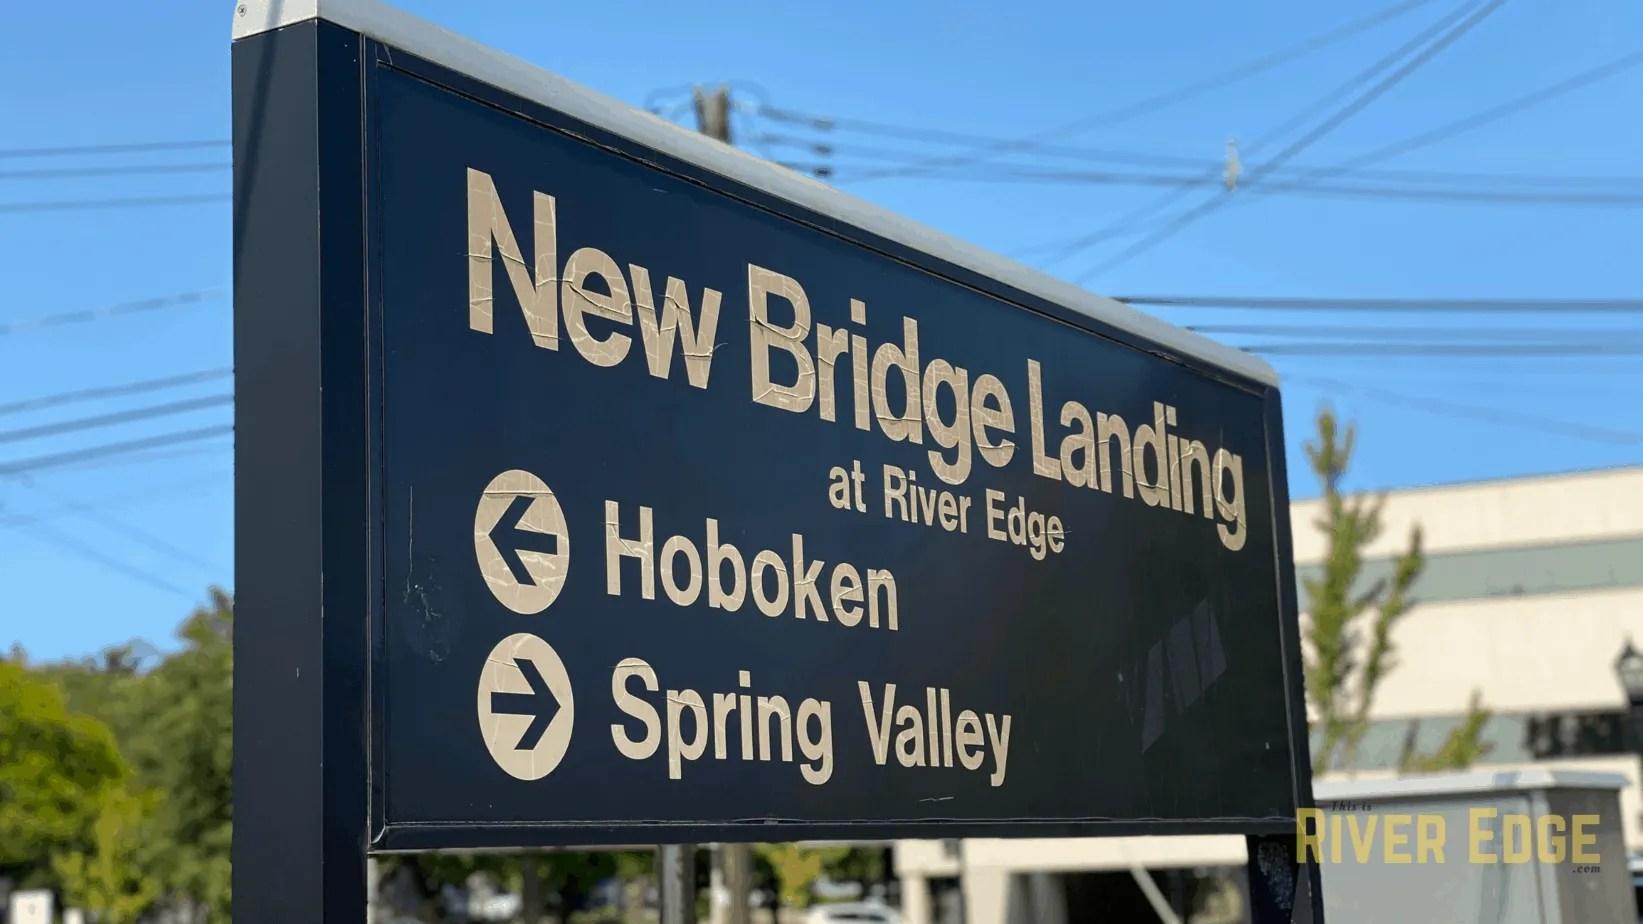 New Bridge Landing Train Station | www.thisisriveredge.com